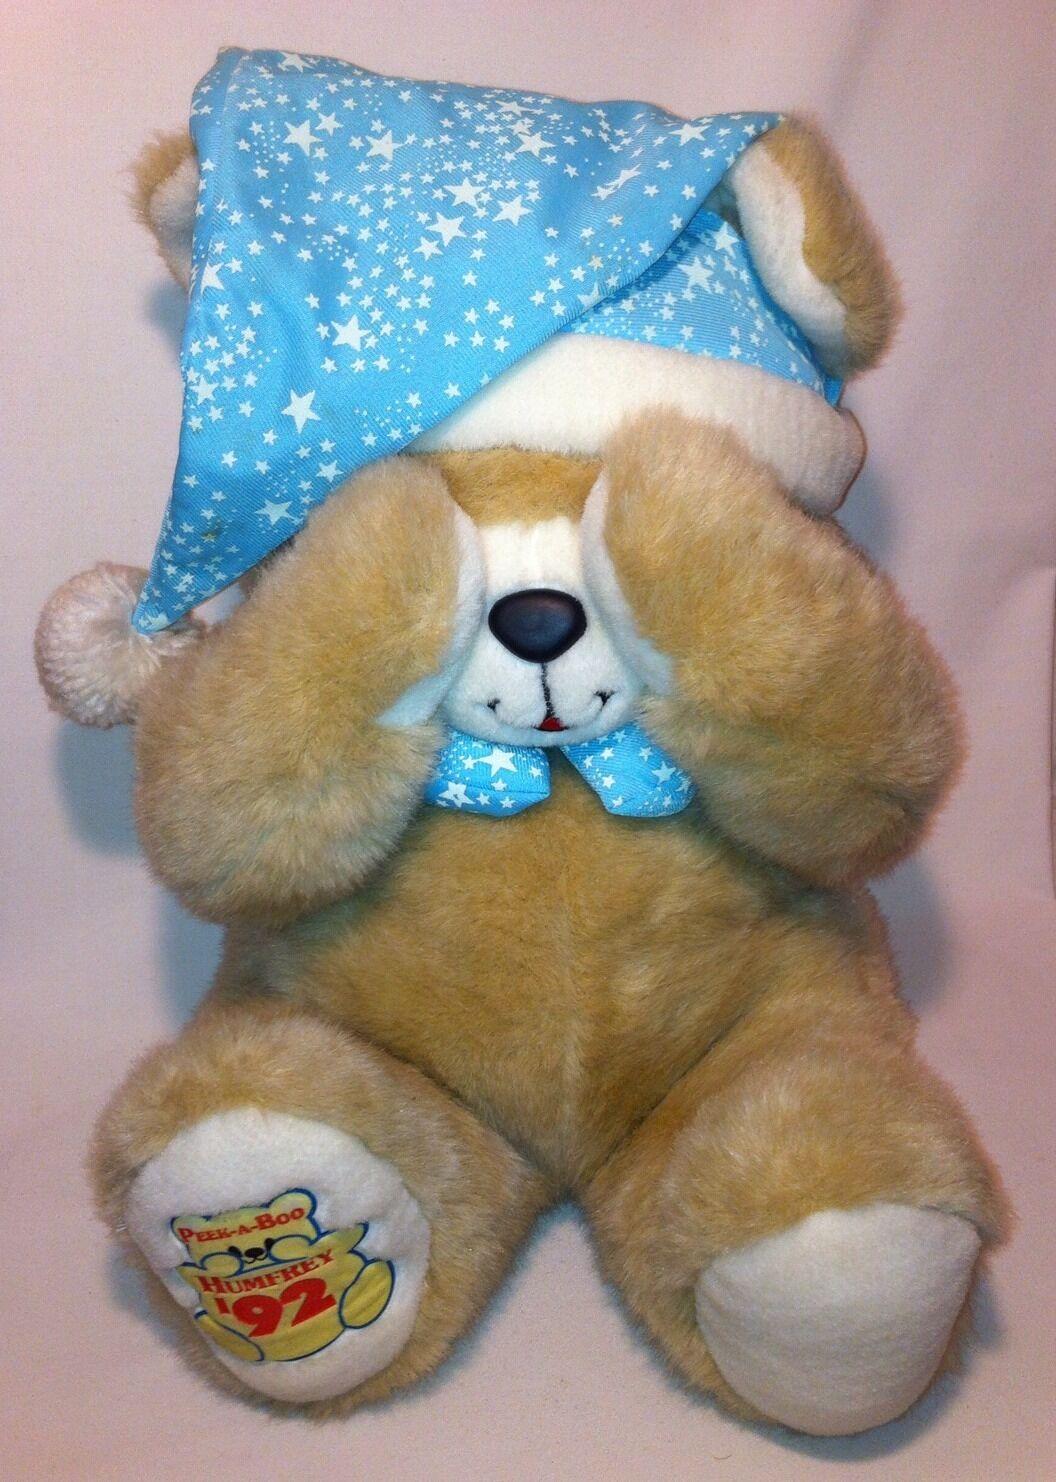 Plush Teddy Bear Peek A Humprey Vintage Stuffed Animal Magnetic Paws